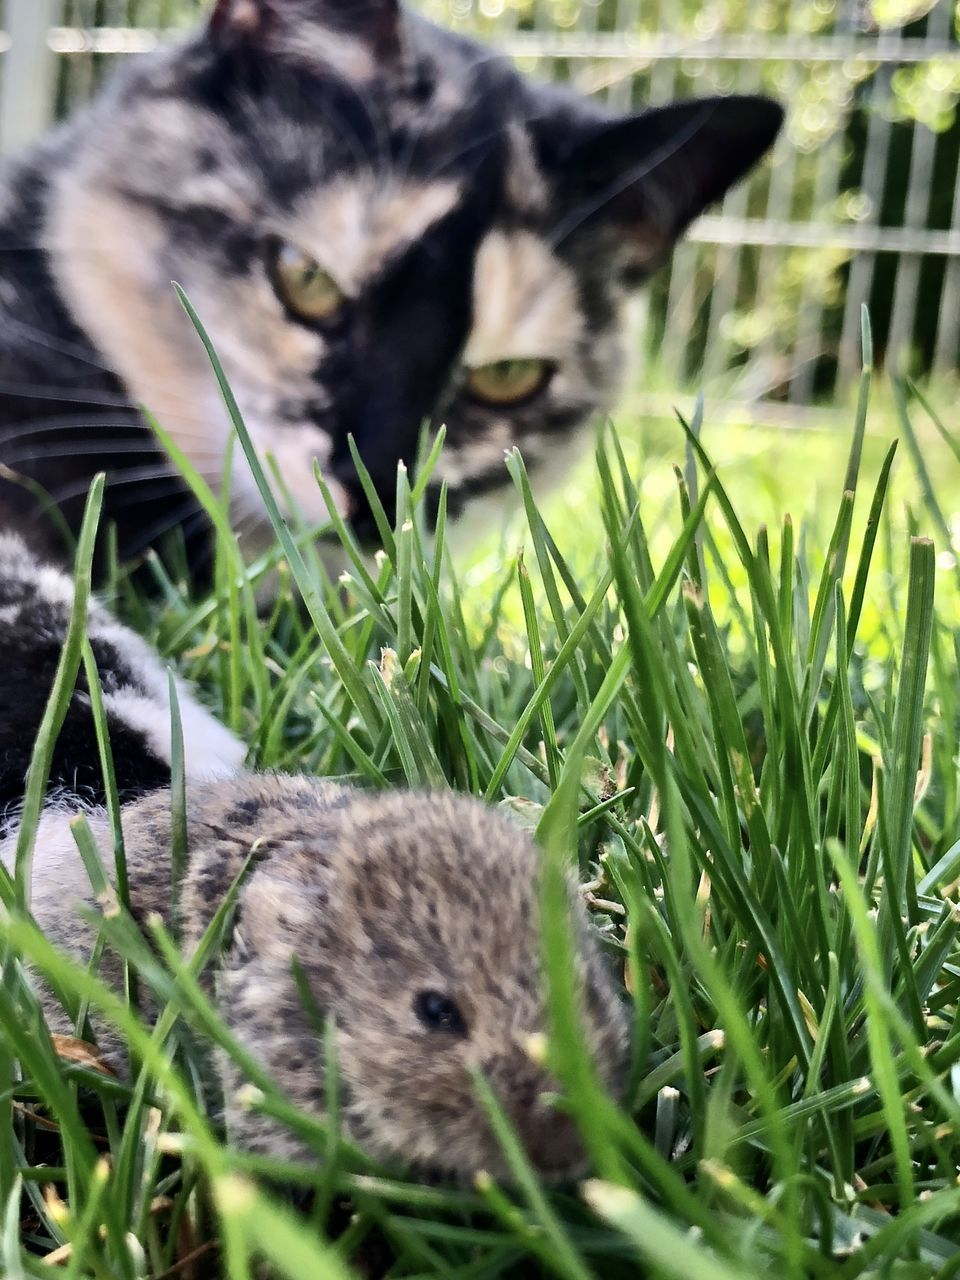 CAT LYING IN GRASS